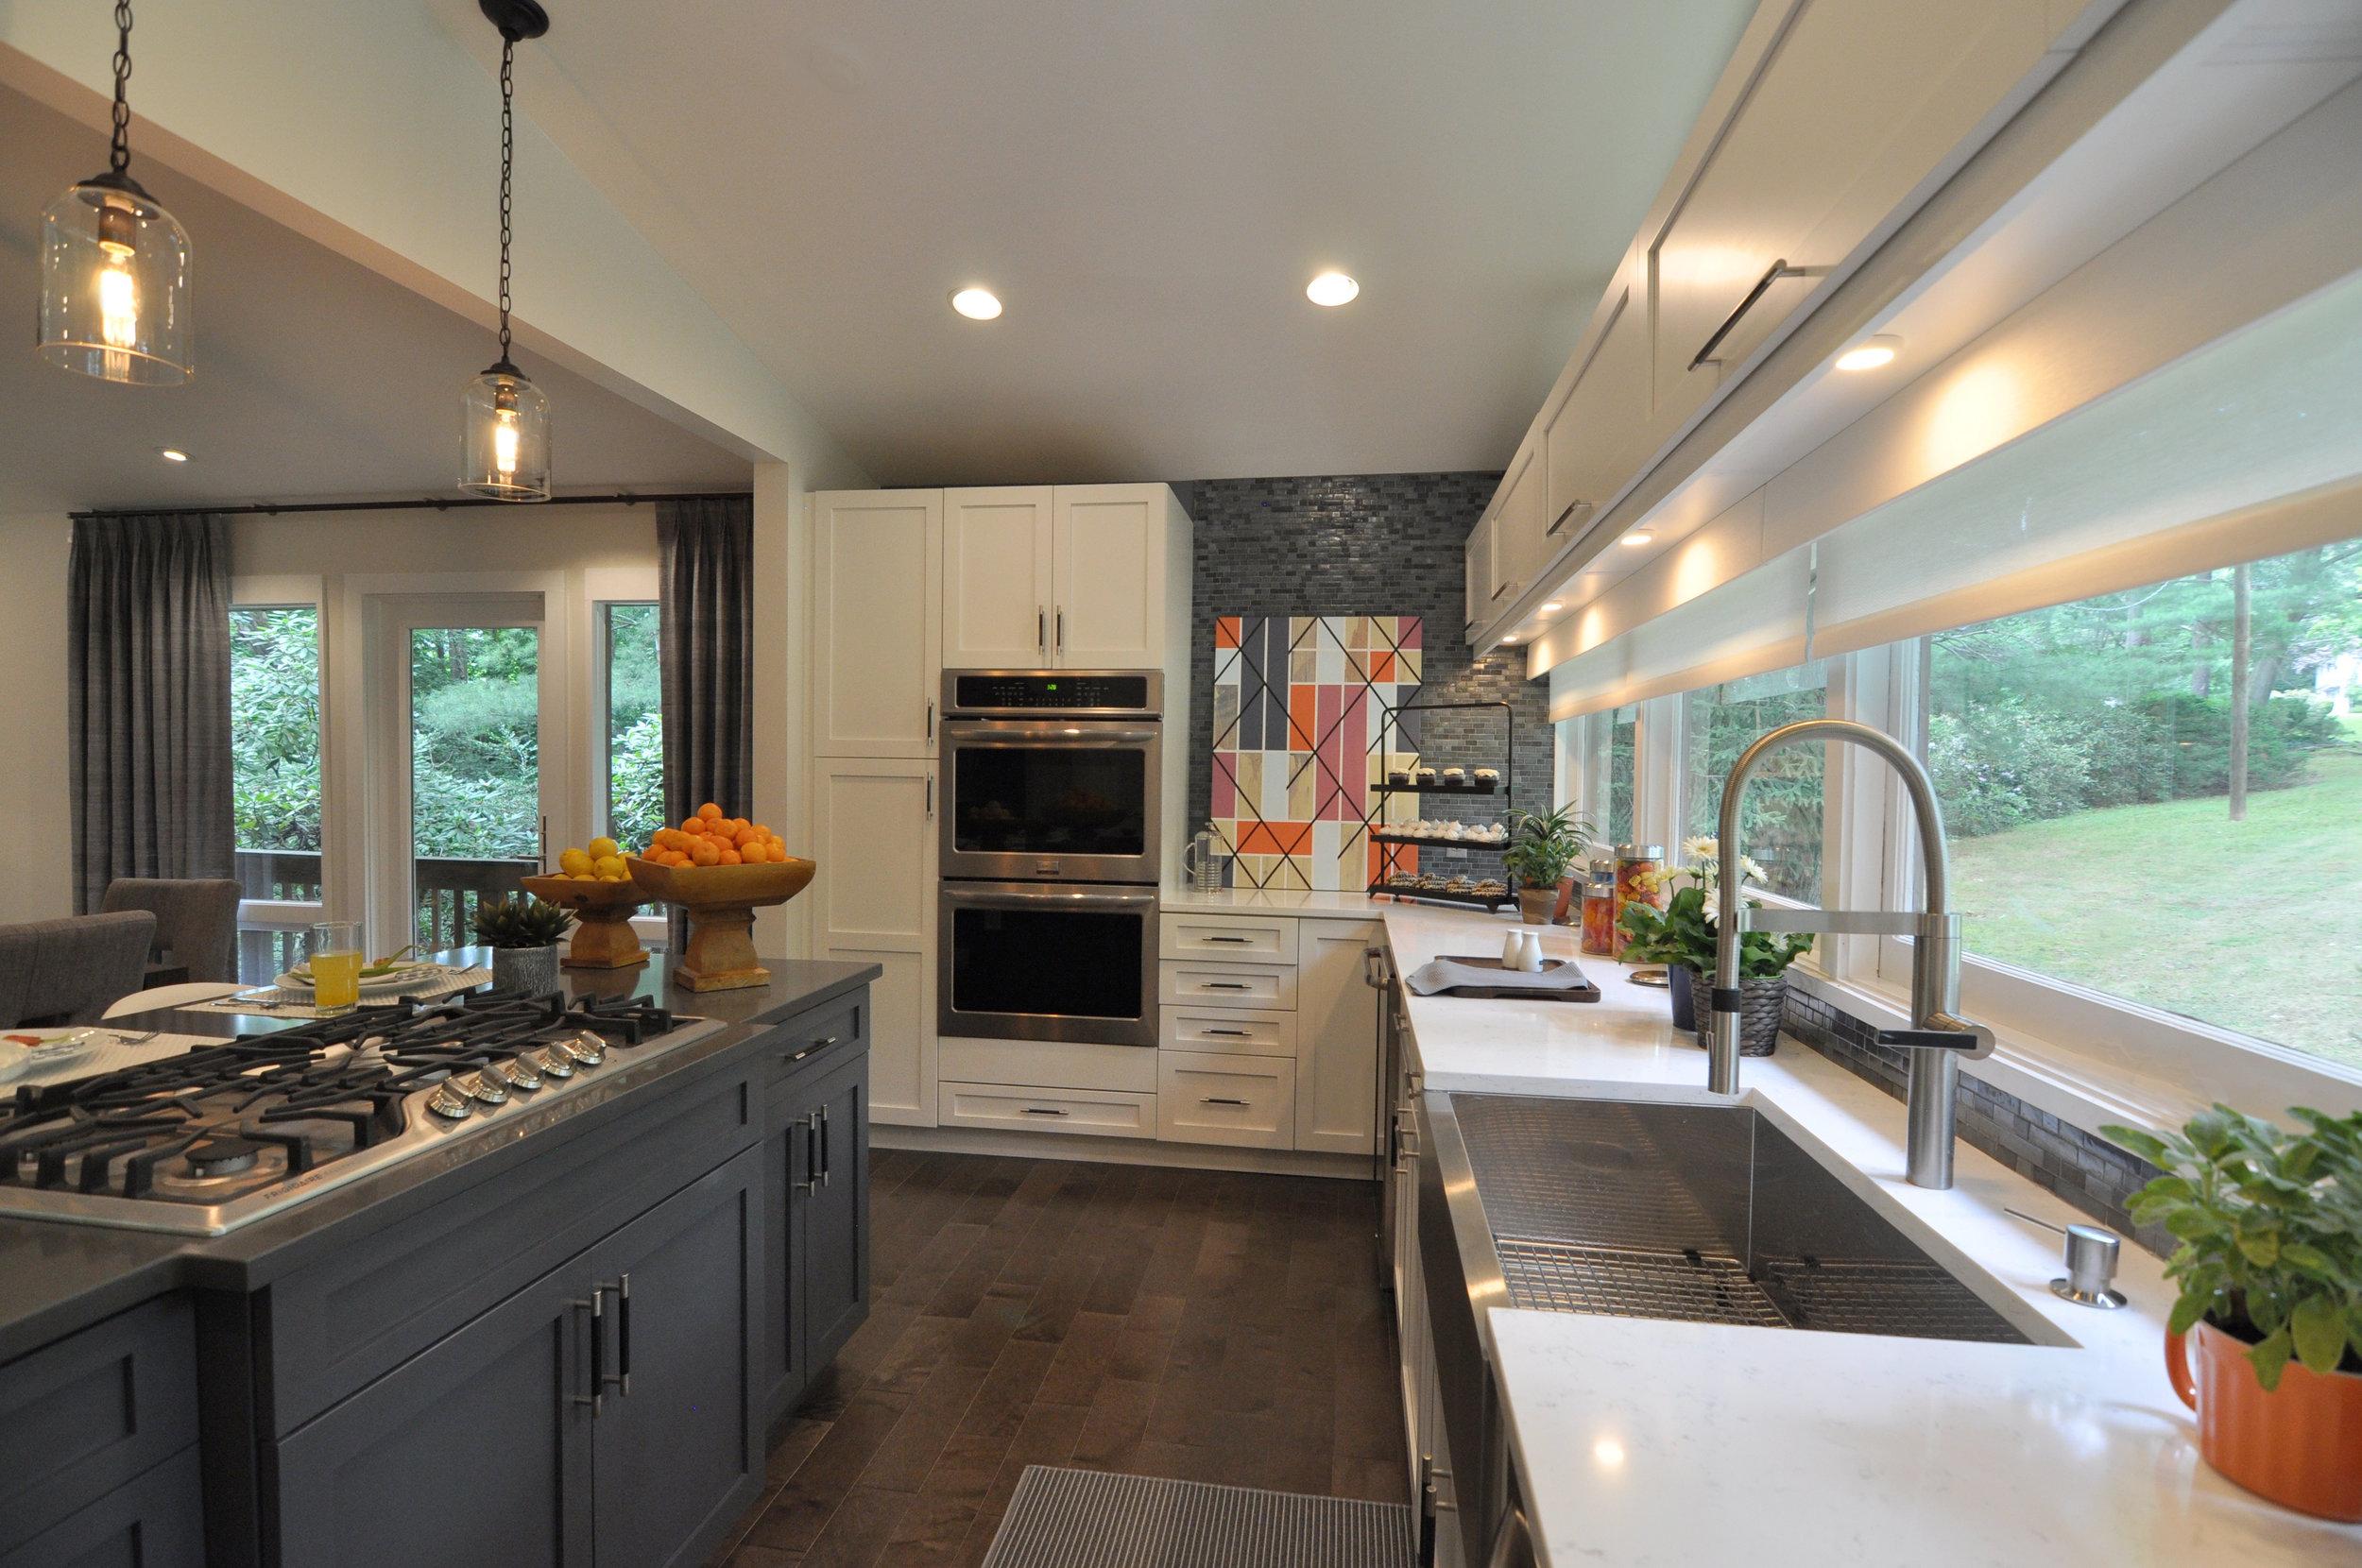 Kim A Mitchell_Design Lead_HGTV_The Property Brothers_Season 6_Episode 9_Modern Kitchen_Blue Glass Backsplash_Dining Room Design_2017.jpg